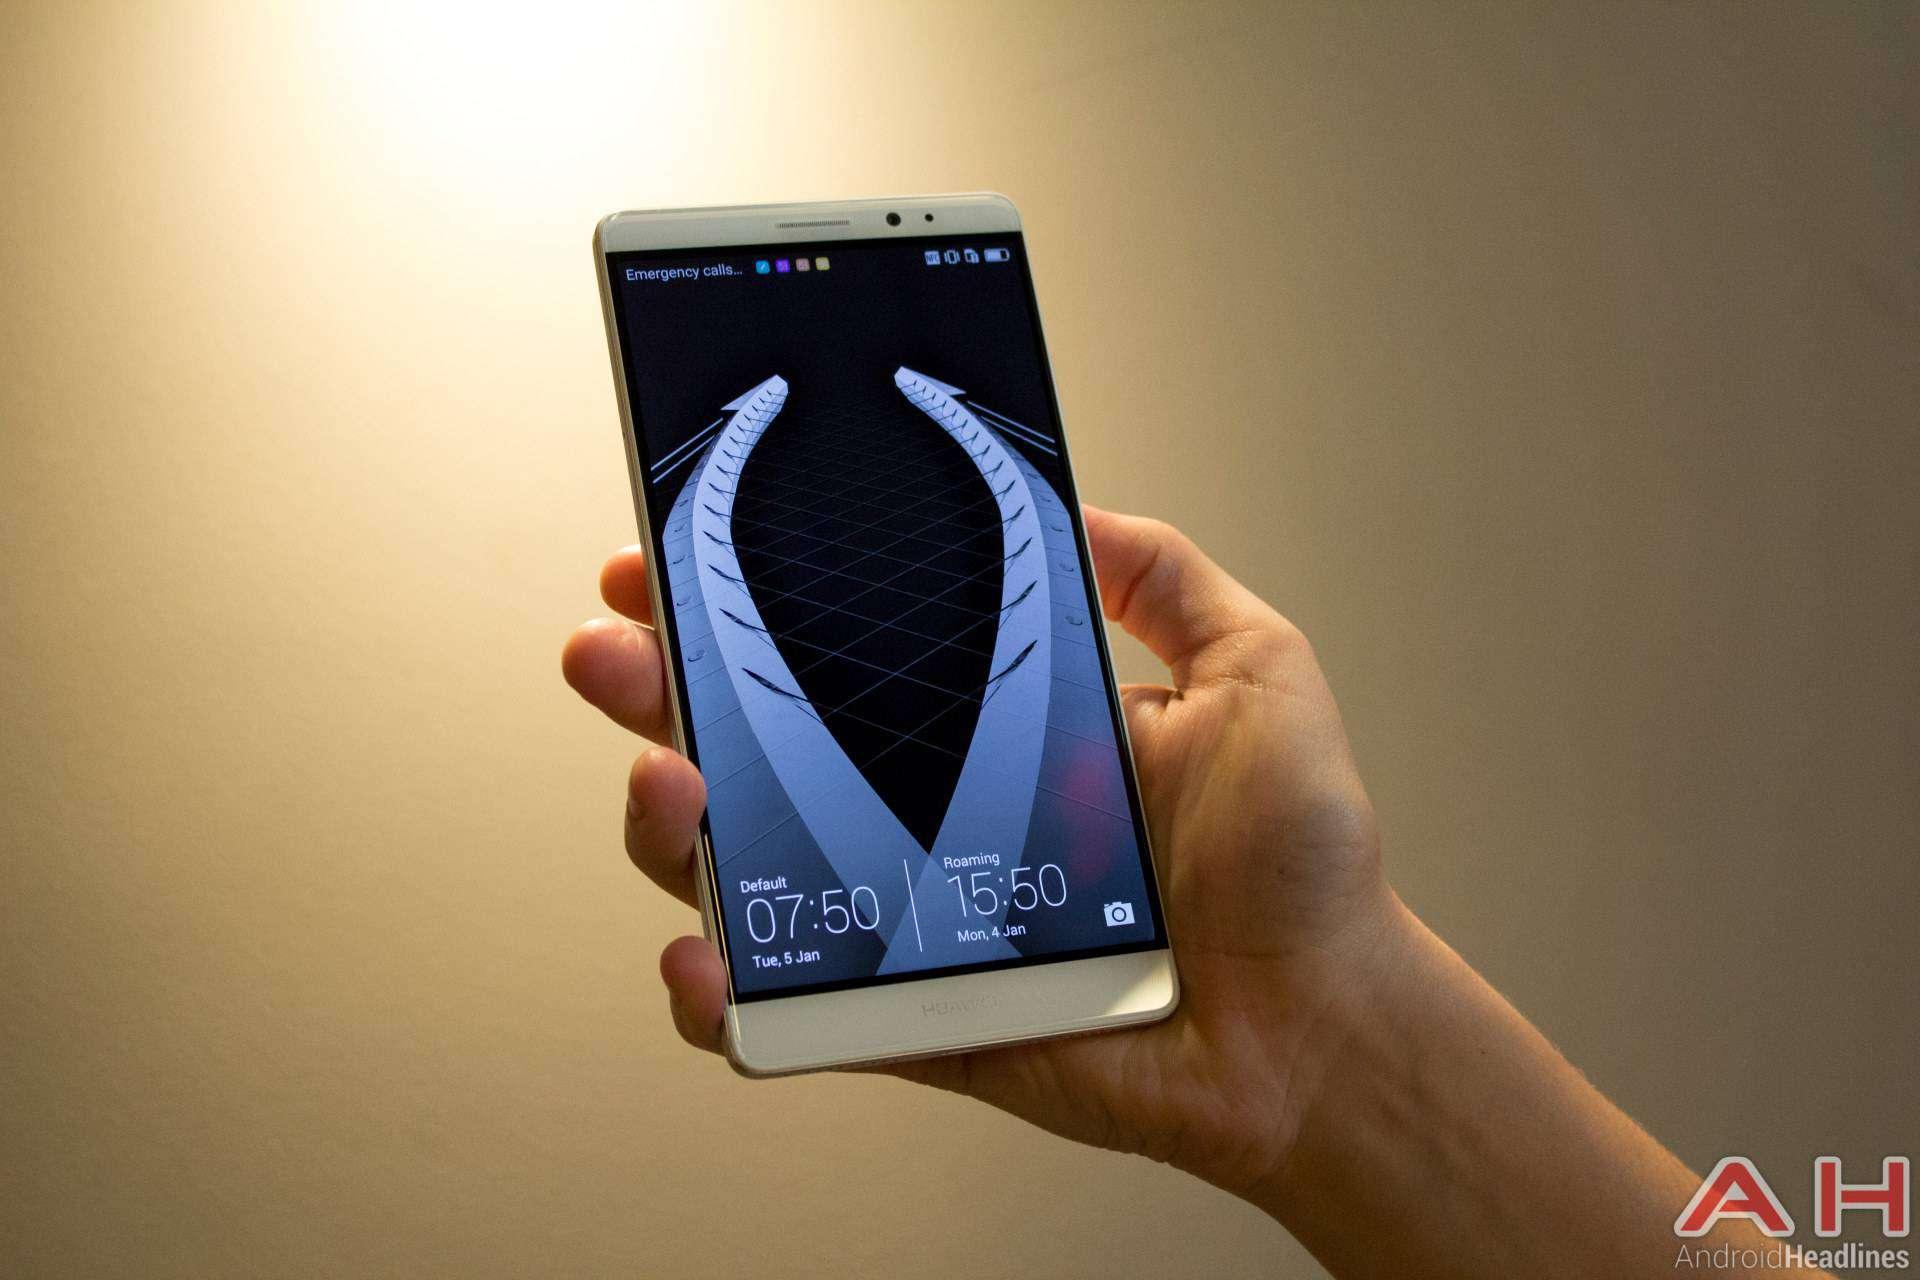 Huawei Mate 8 CES 2016 AH 16